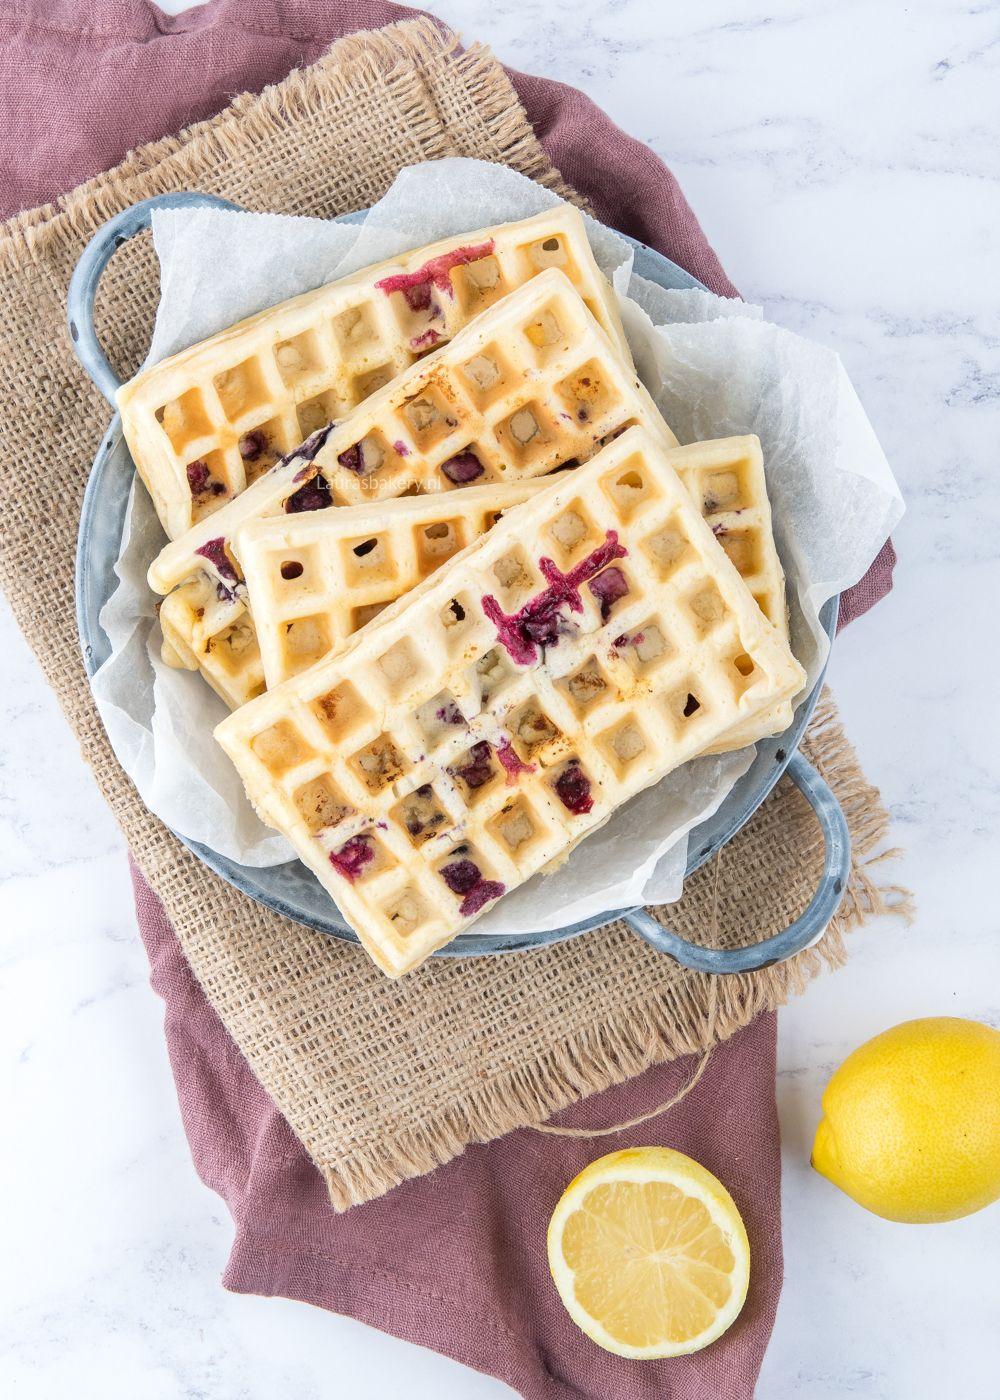 Blueberry-lemon wafels